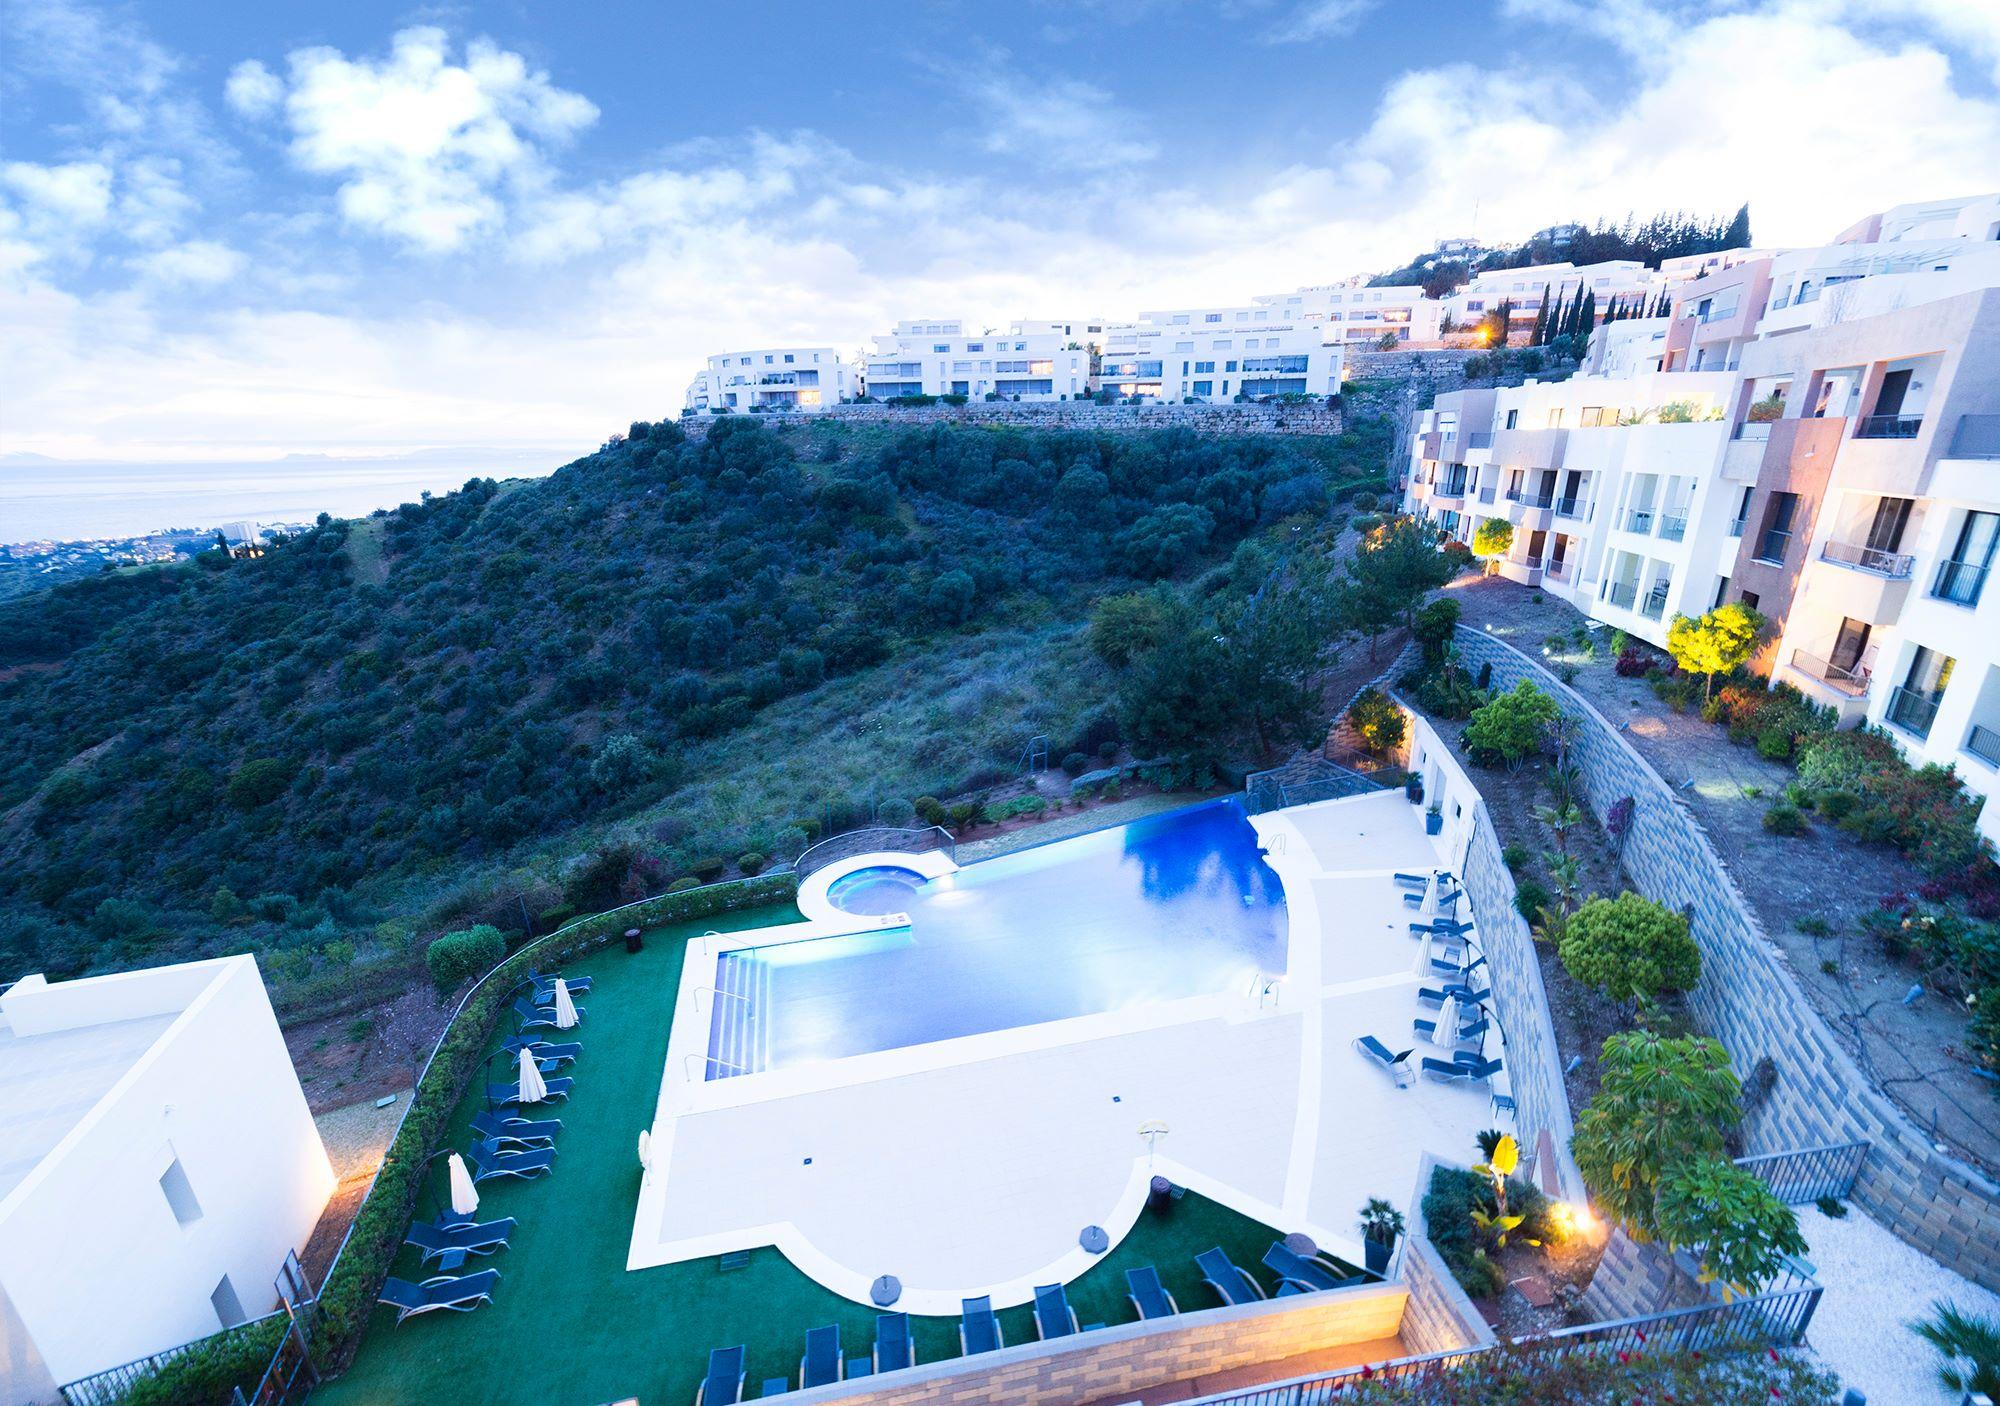 Samara Resort Marbella Apt 712 WHUDAT 112